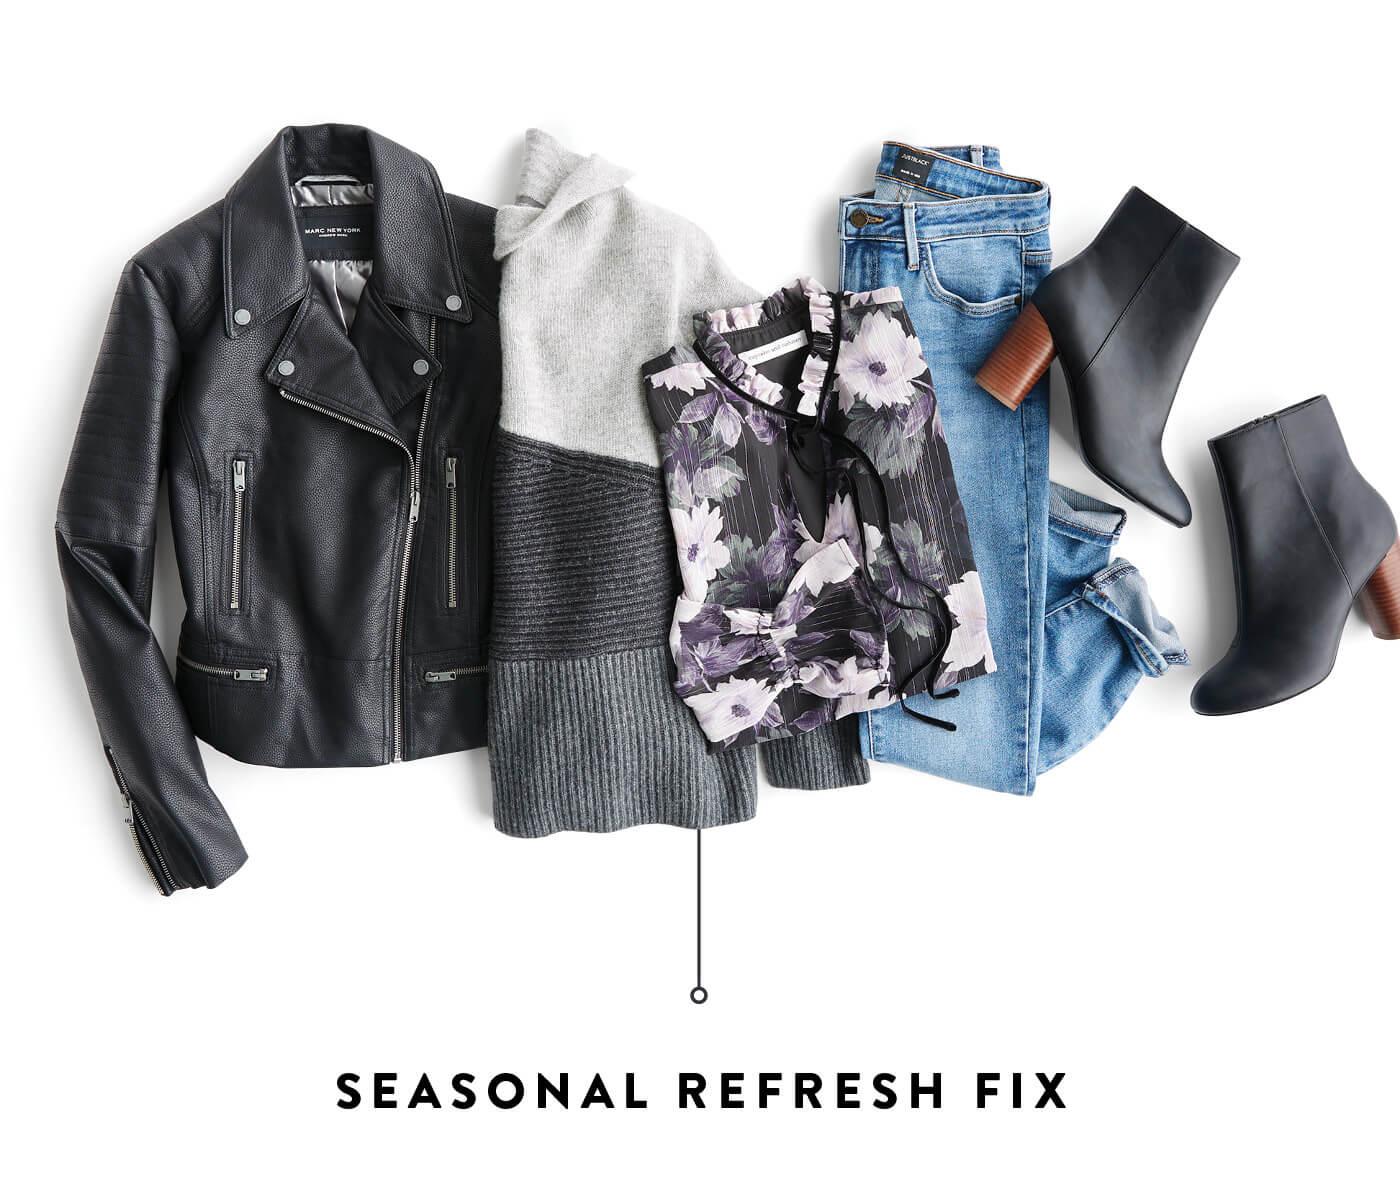 seasonal refresh fix